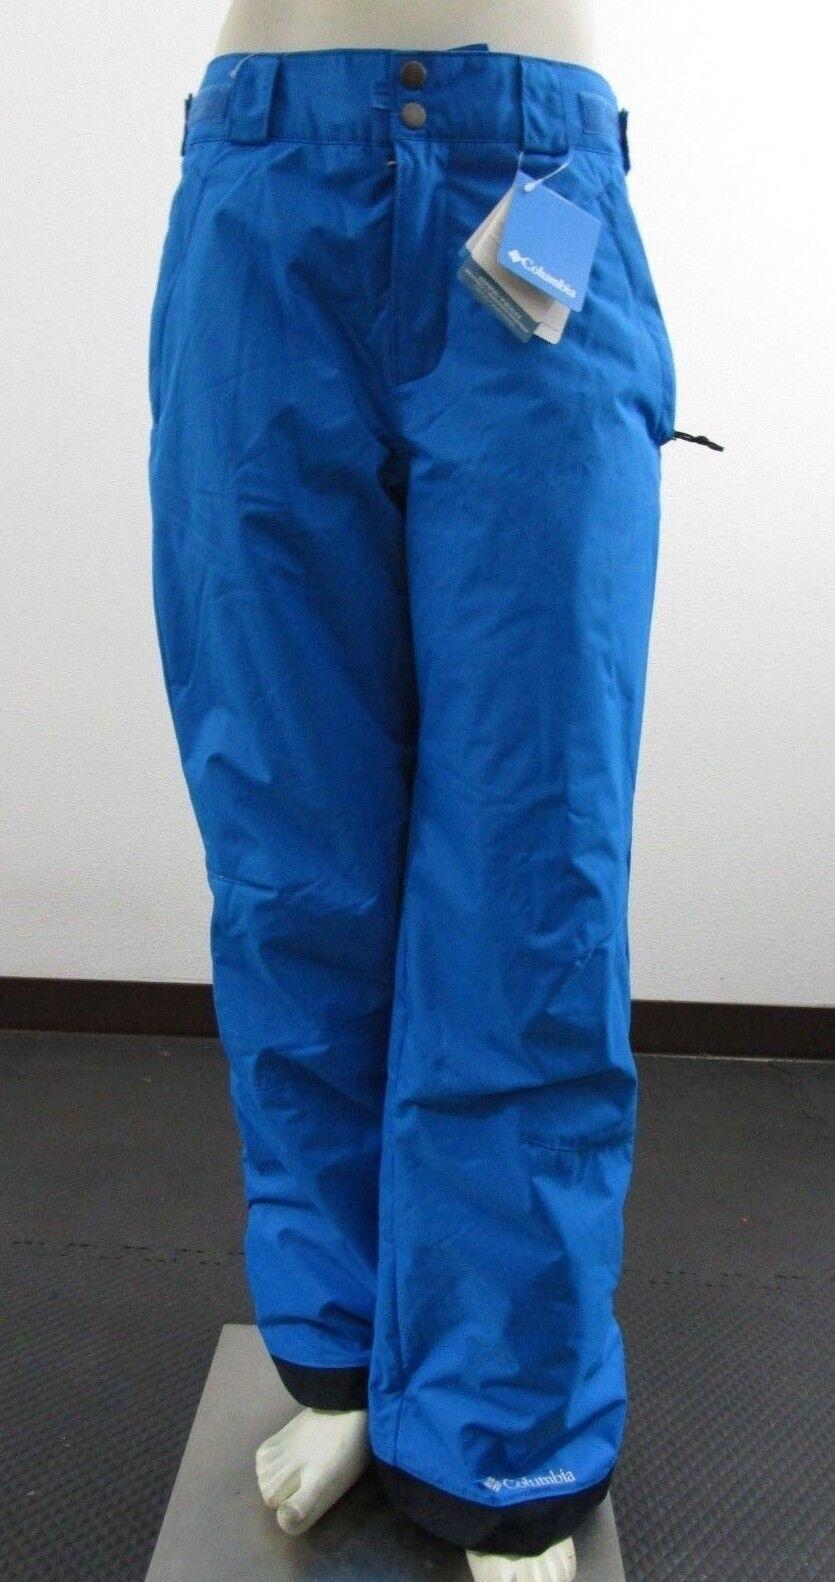 NWT Mens Columbia Arctic Trip Insulated Waterproof Snow Ski Pants Compass bluee